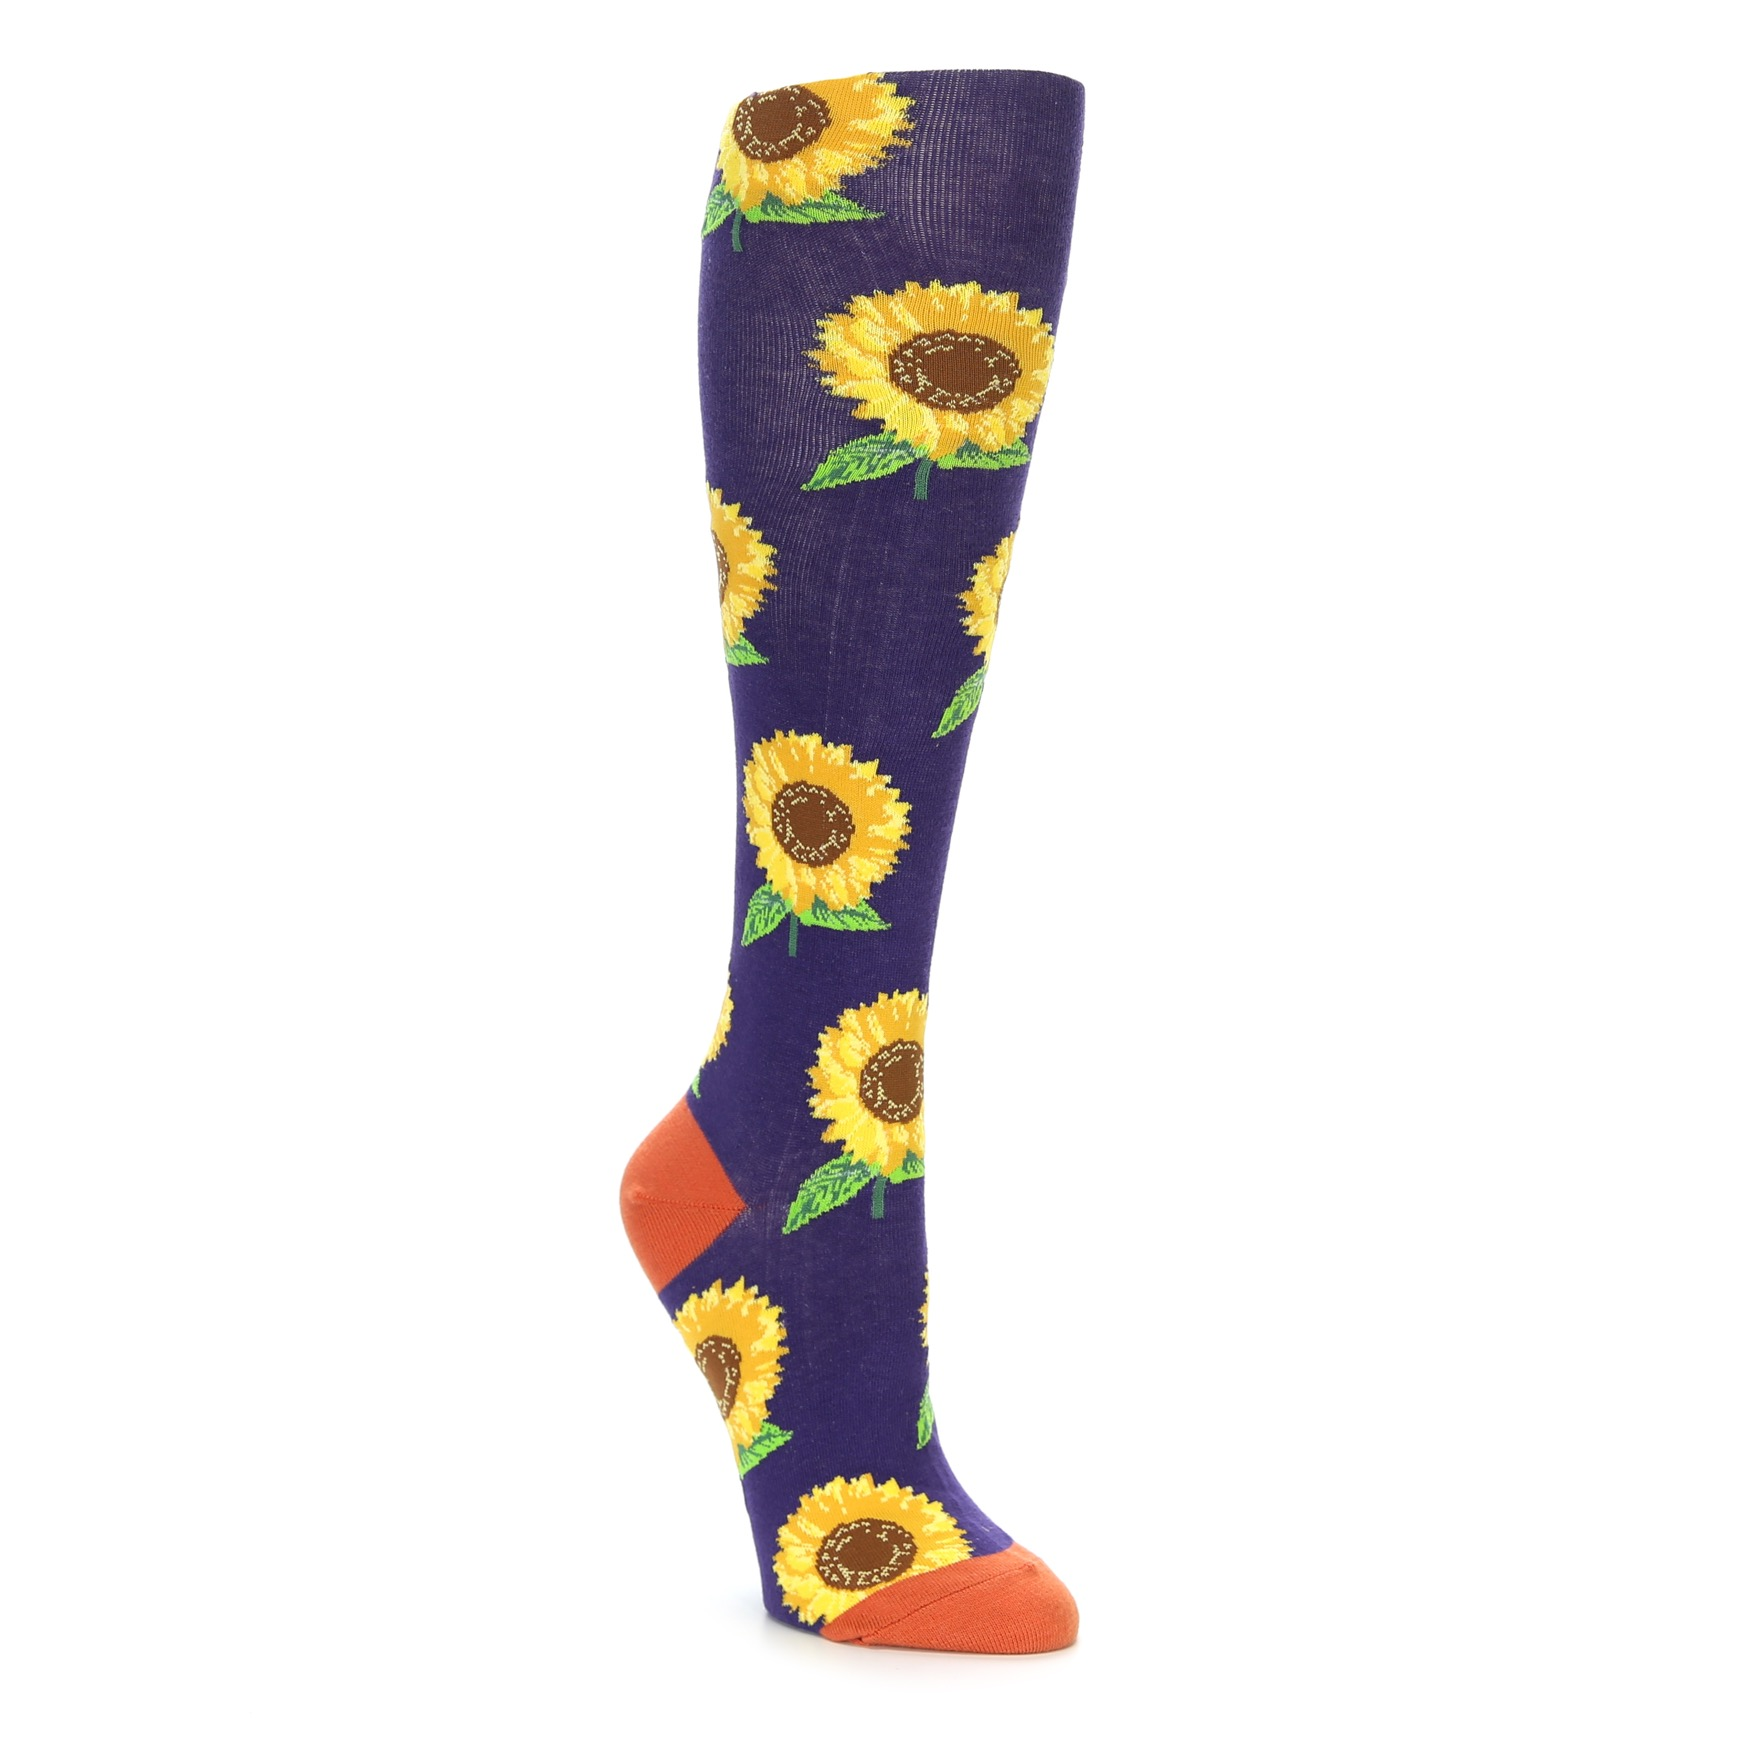 1fb3041dd20ed Purple Yellow Sunflowers Women's Knee High Socks | boldSOCKS